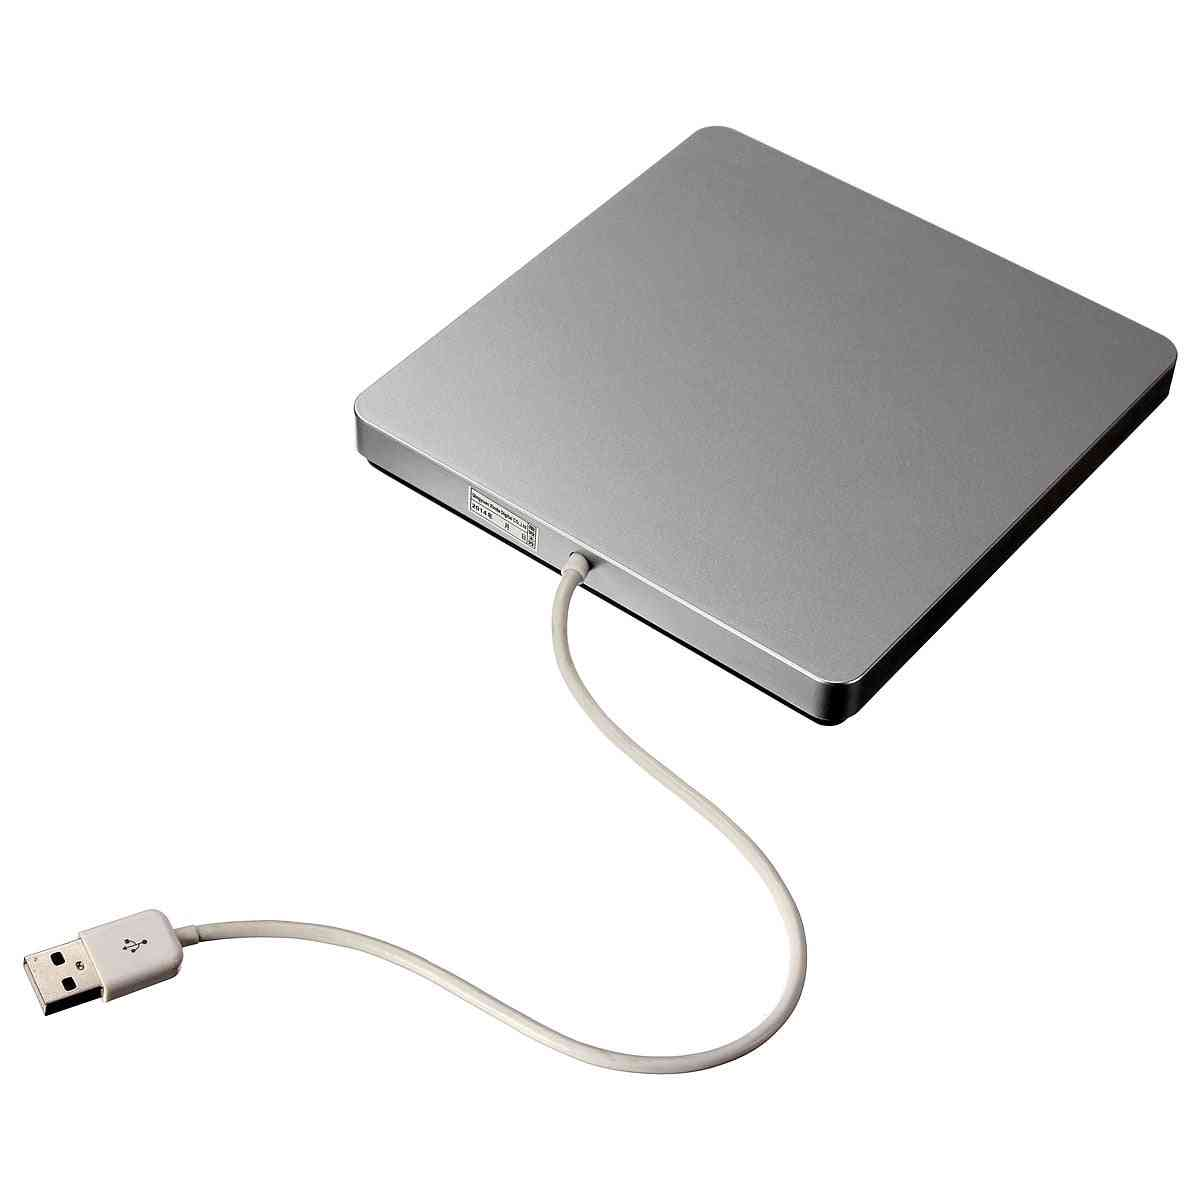 Usb External Cd Dvd Rom Rw Player & Burner Drive